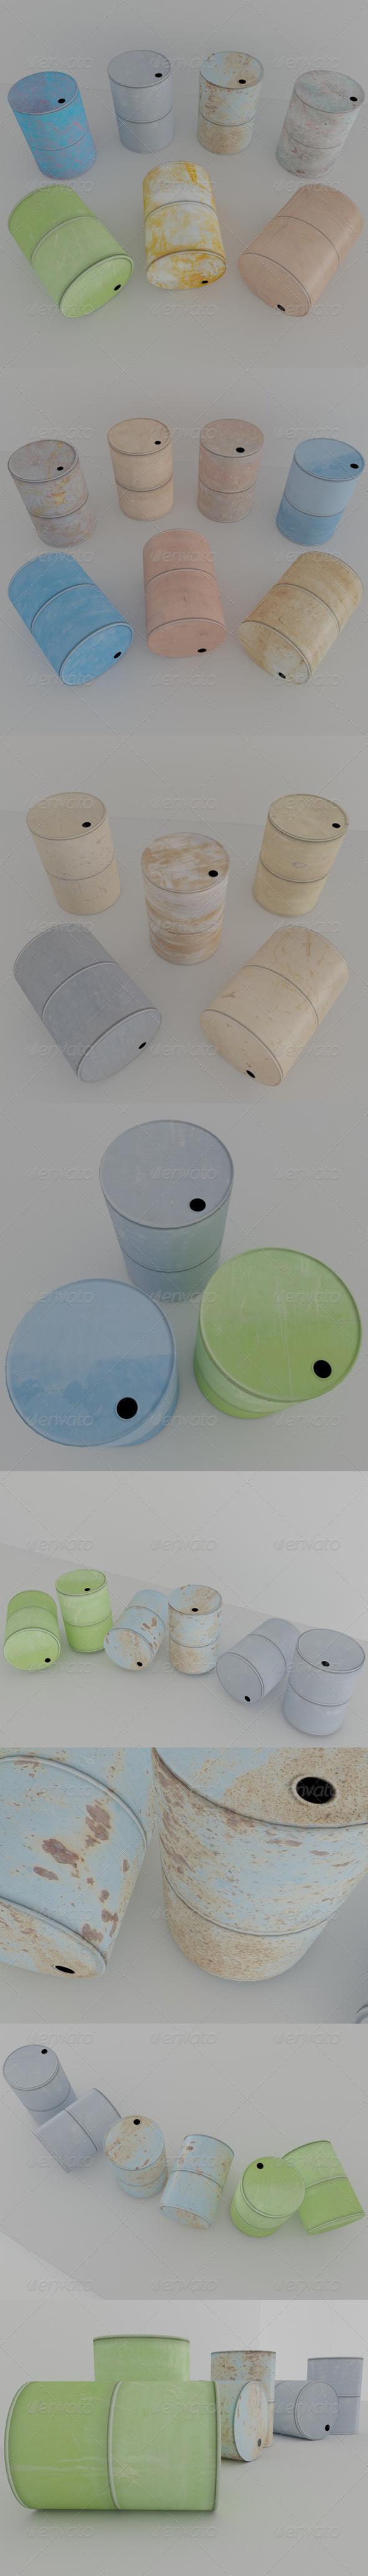 Metal Barrel - 3DOcean Item for Sale